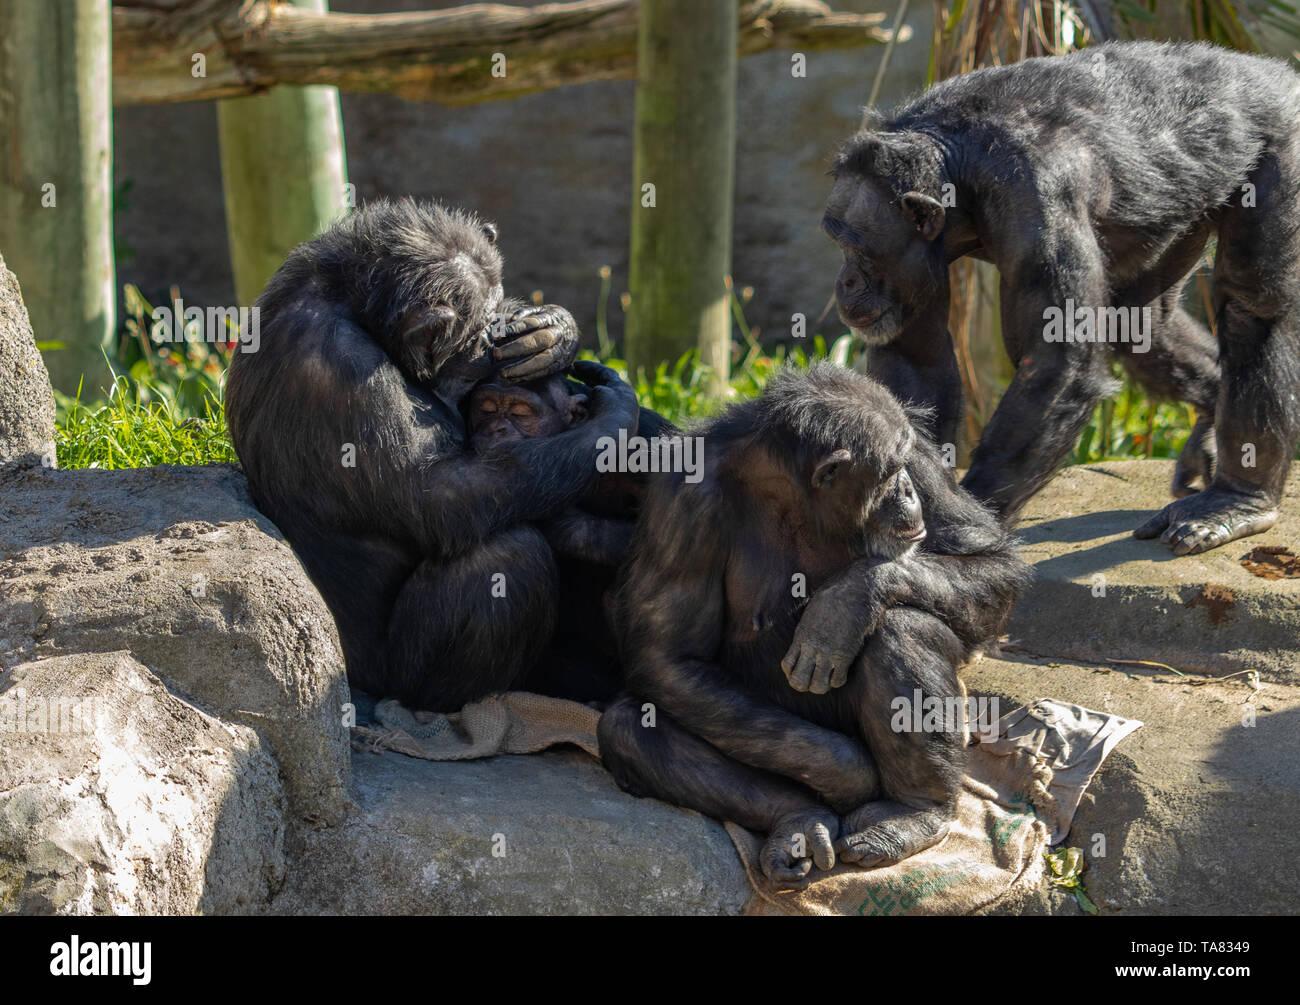 Chimp cuddling baby - Stock Image